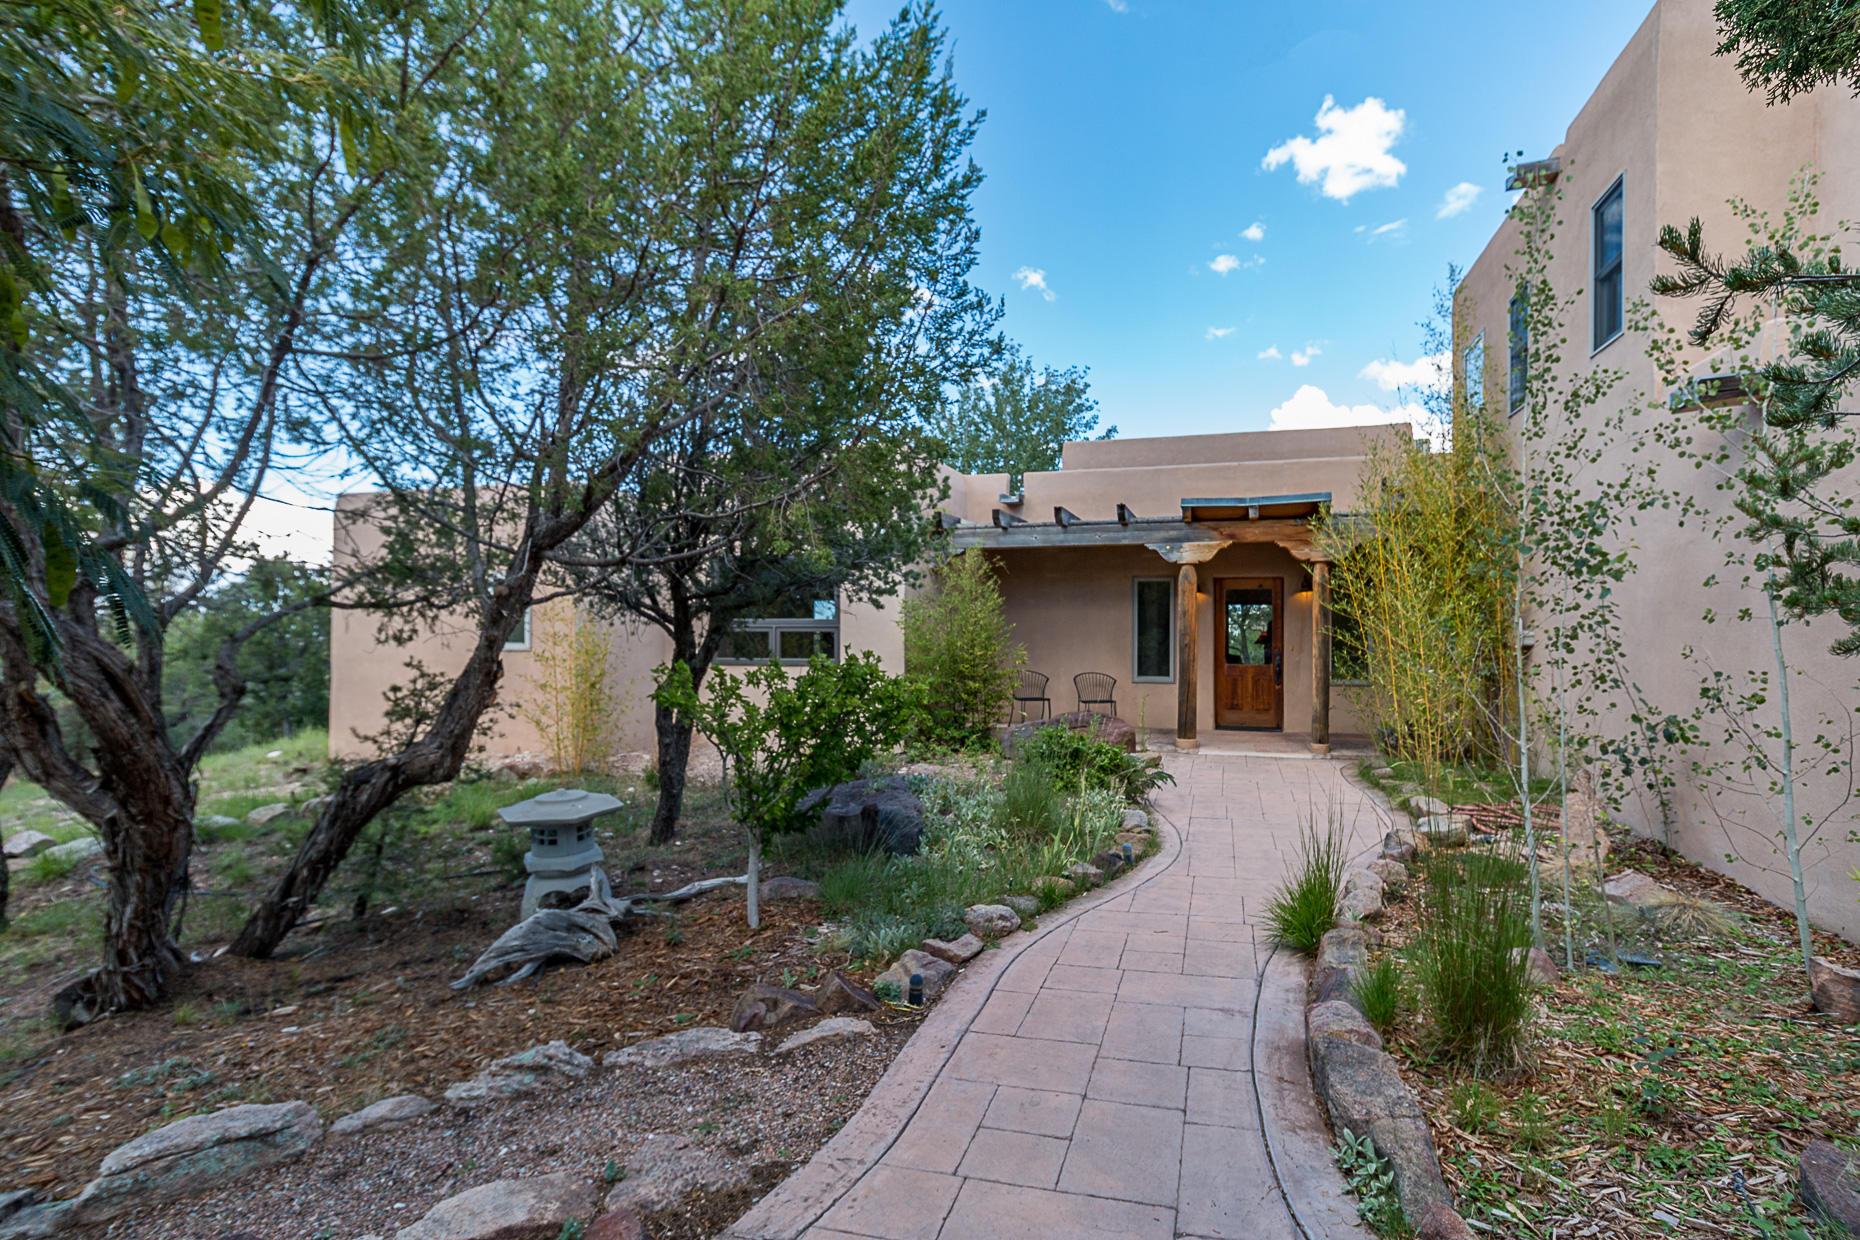 9 Punta Linda, Sandia Park, NM 87047 - Sandia Park, NM real estate listing